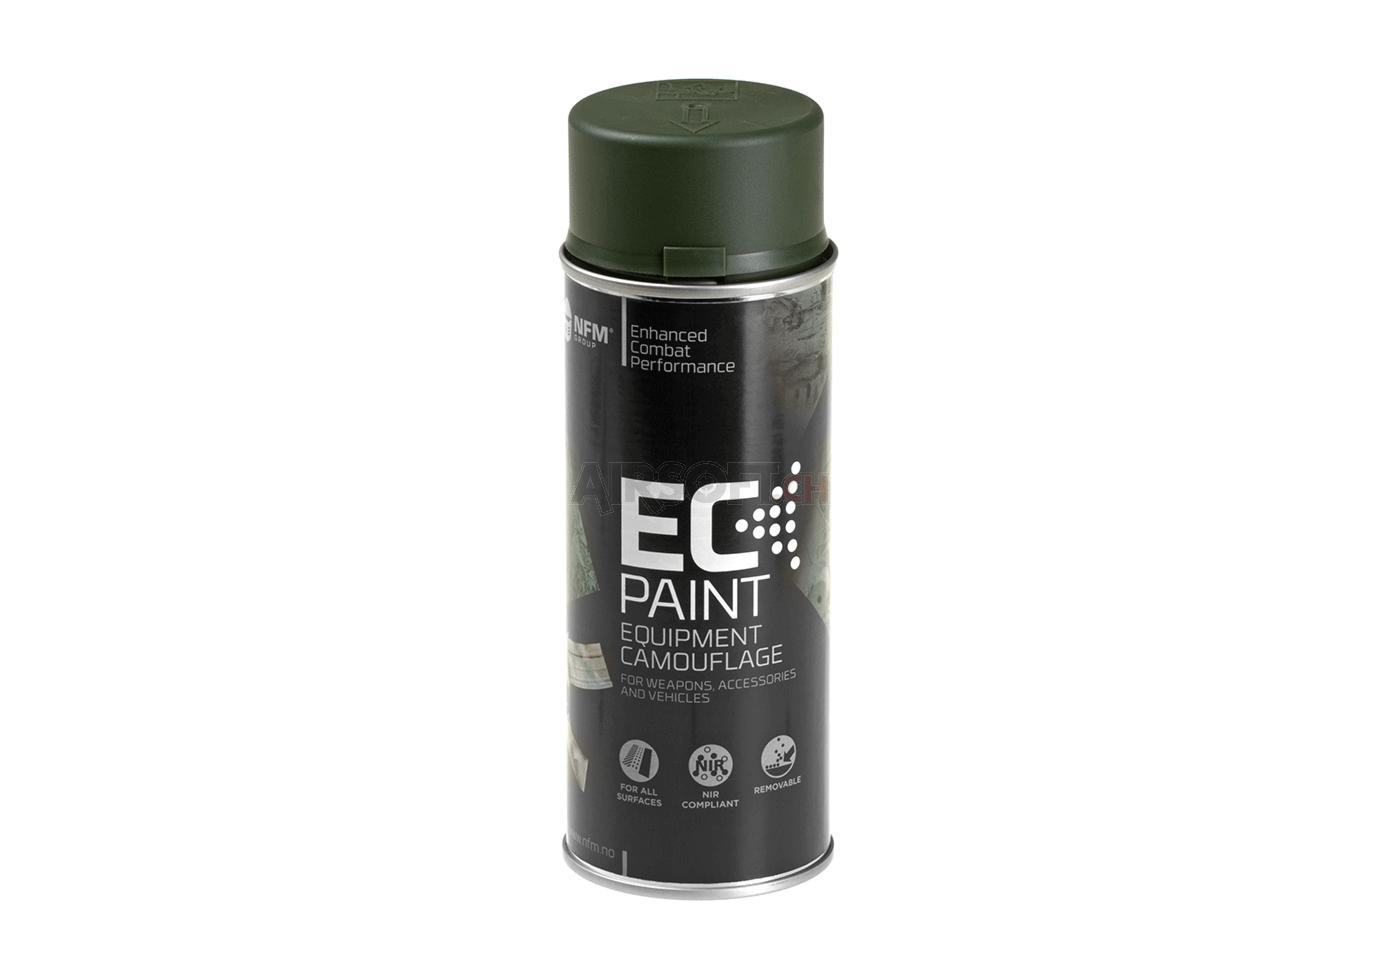 Nir Spray Paint